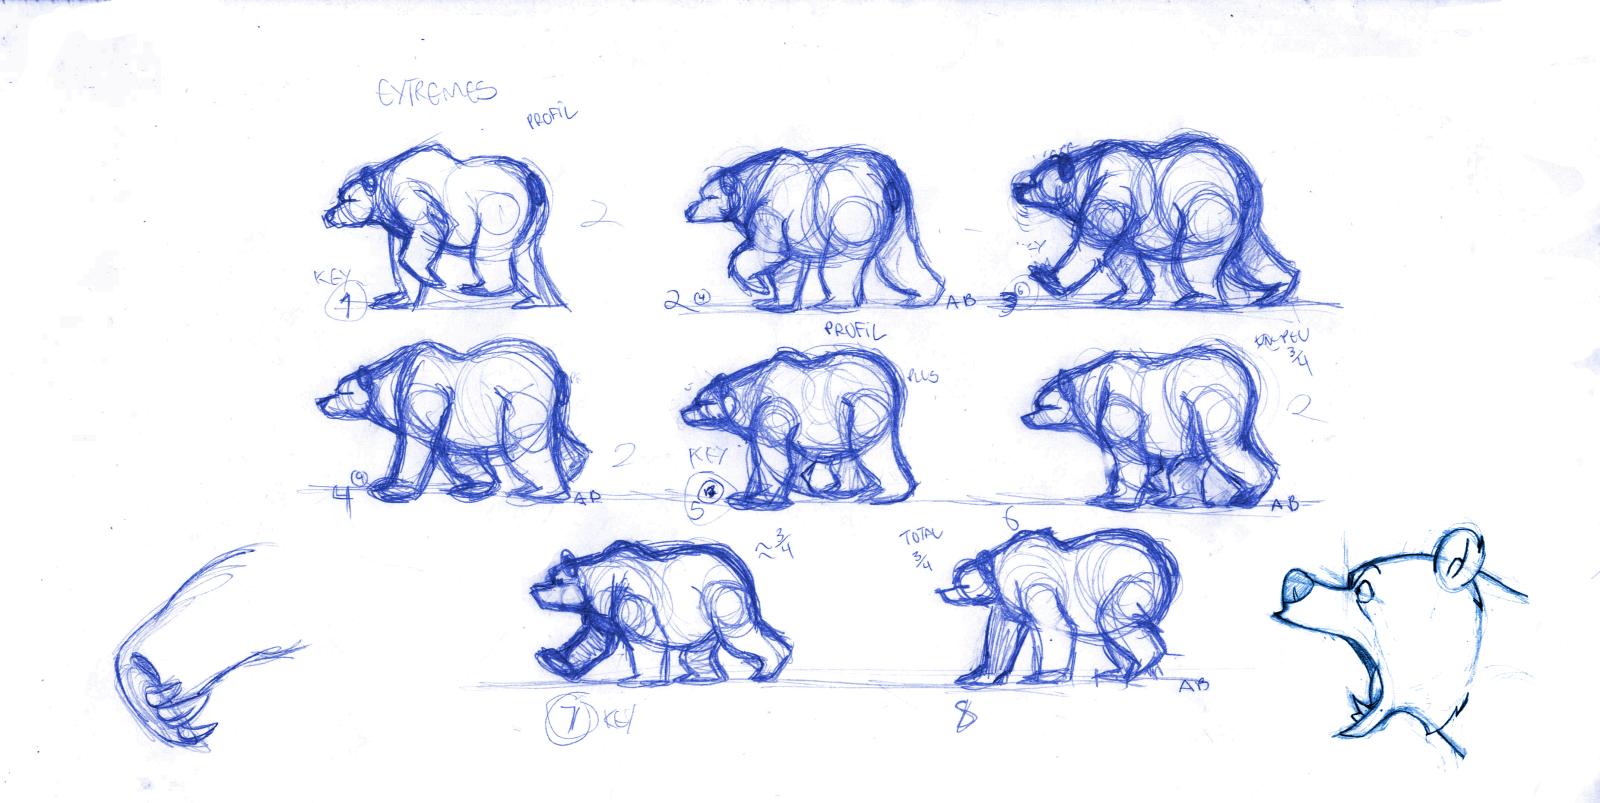 bear walk cycle - Google Search | Help with Drawing ... Walking Bear Drawing